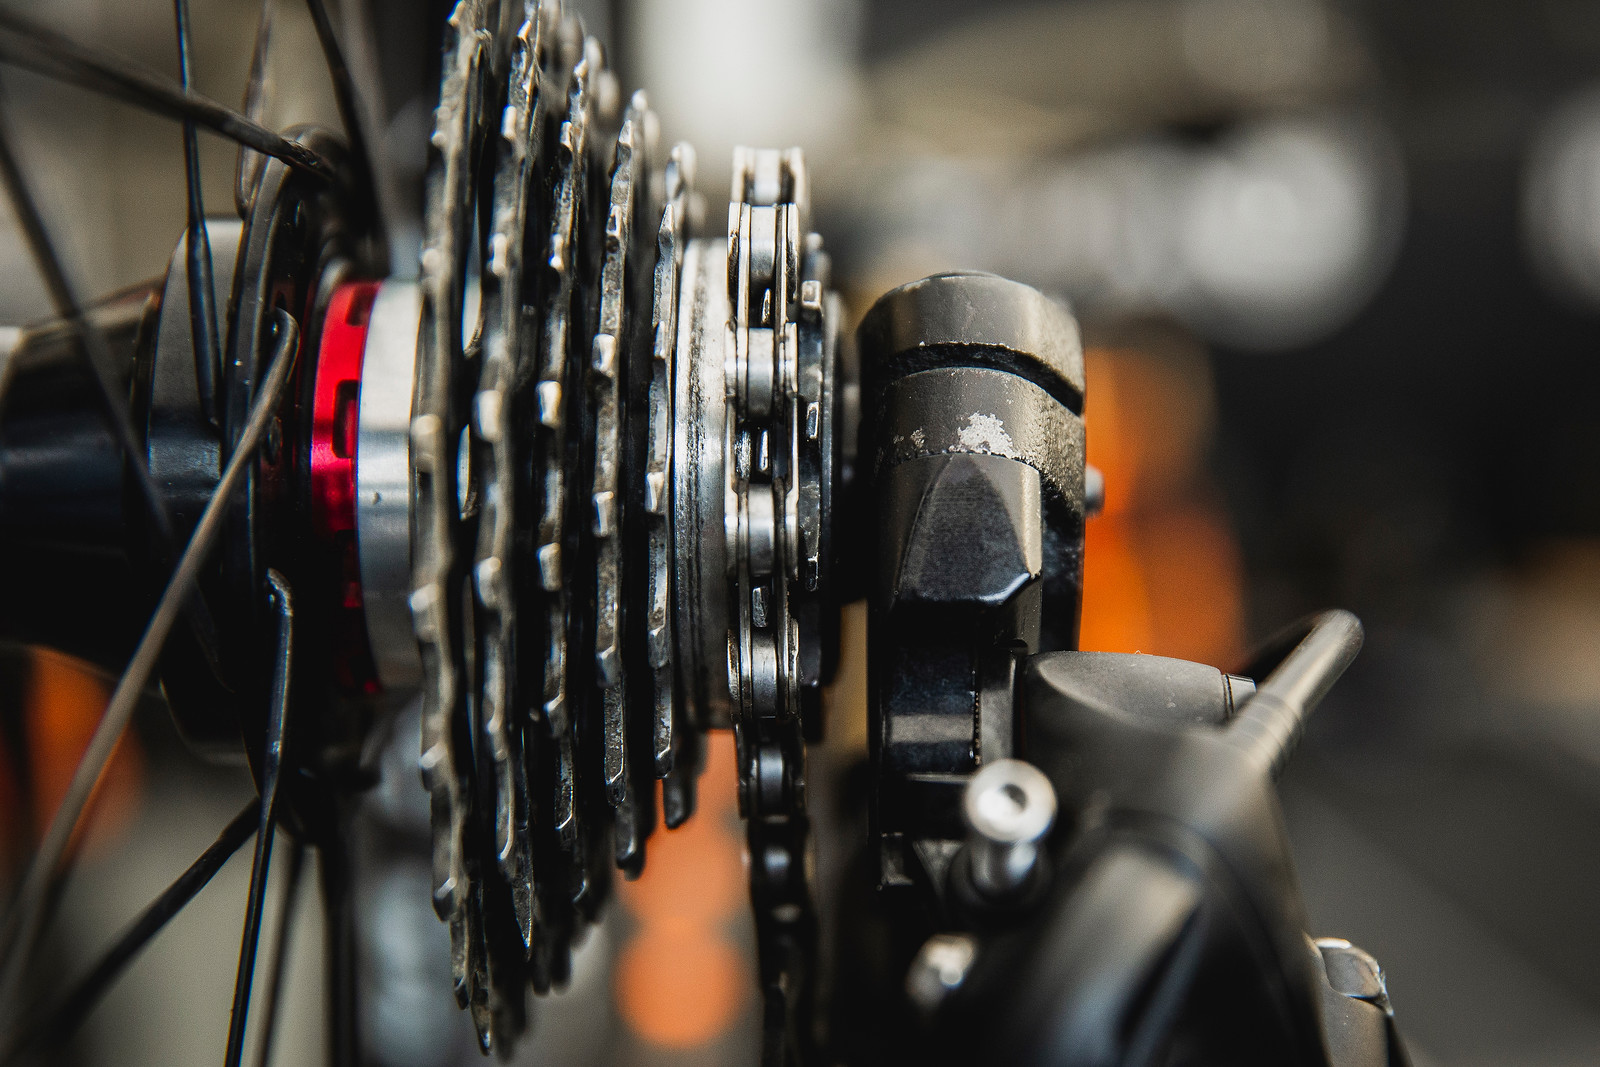 PIT BITS - Lenzerheide World Cup Downhill - PIT BITS - 2019 Lenzerheide World Cup Downhill - Mountain Biking Pictures - Vital MTB